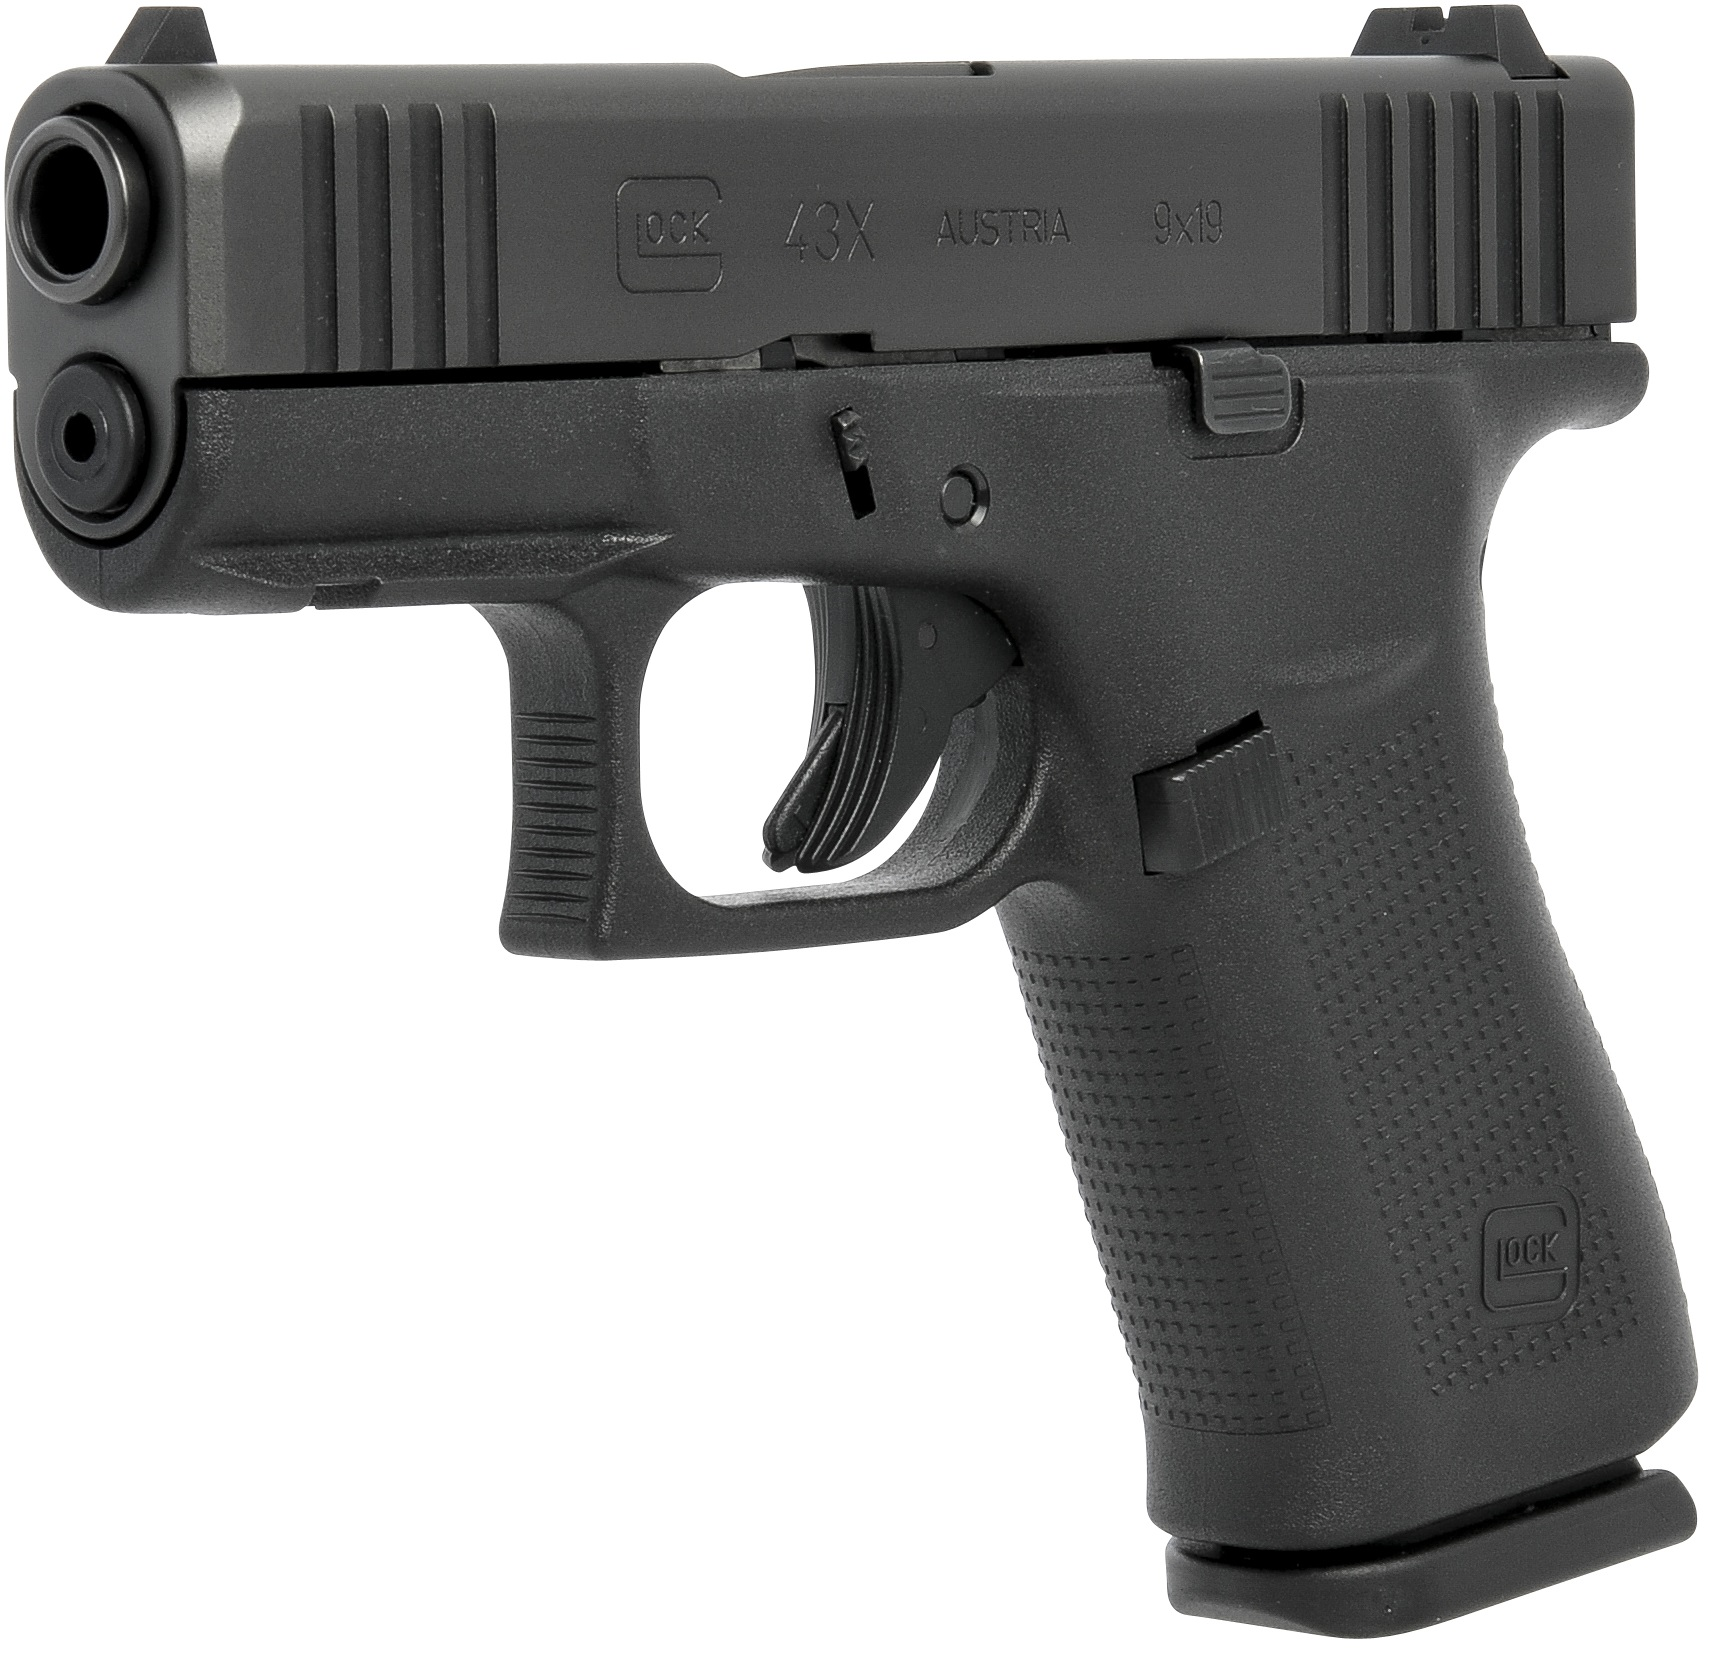 Image result for glock 43 rail